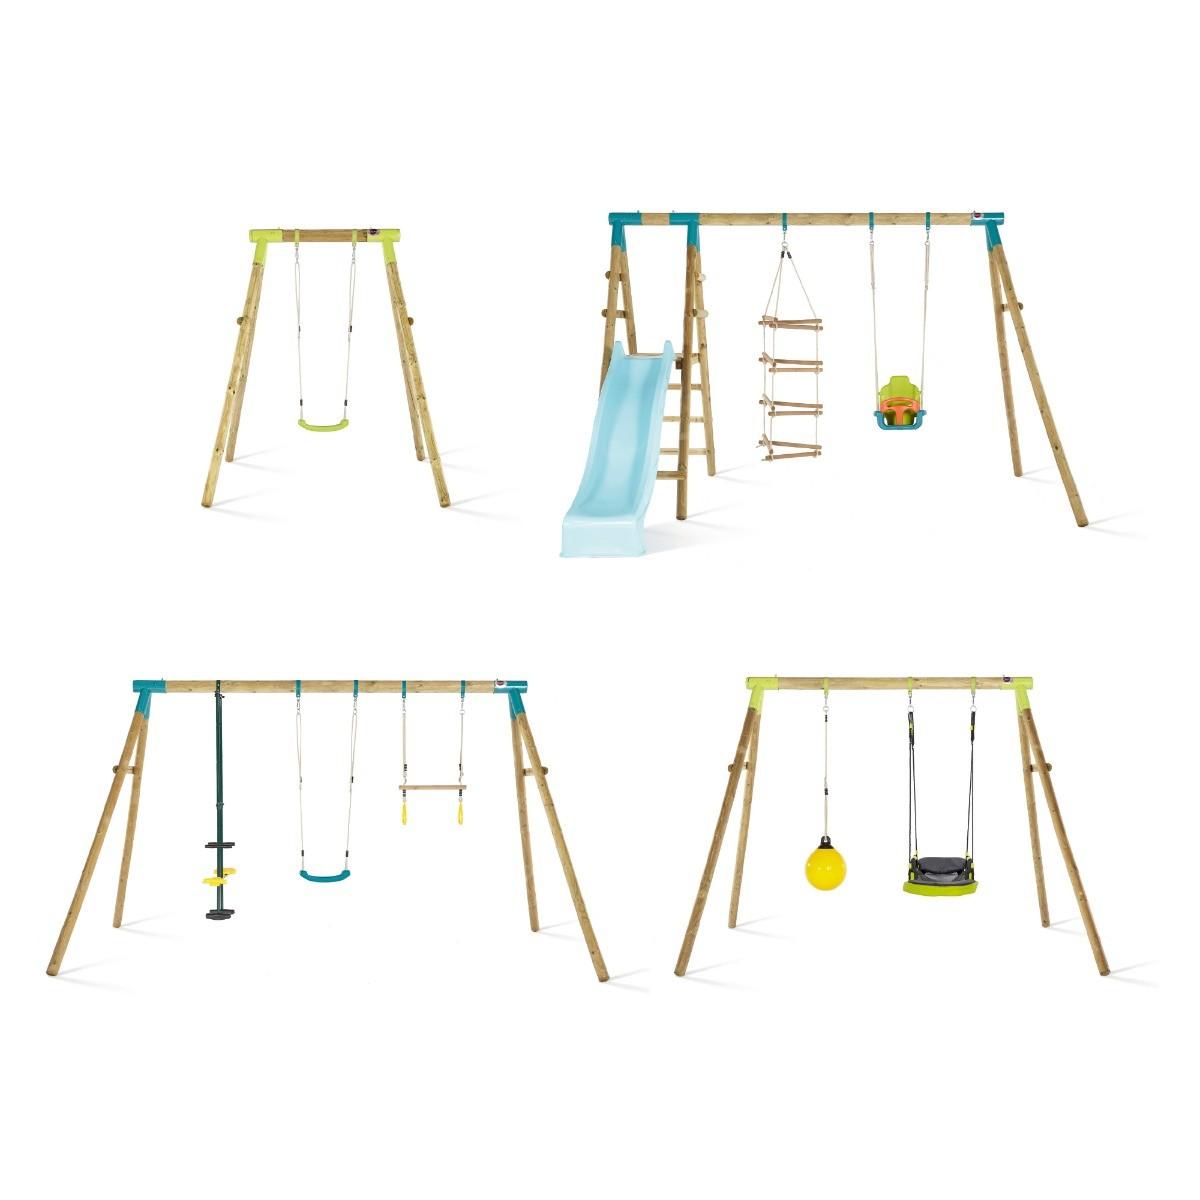 Heavy Duty Swing Seat Swing Set Accessories Swing Seat Replacement BLUE AM